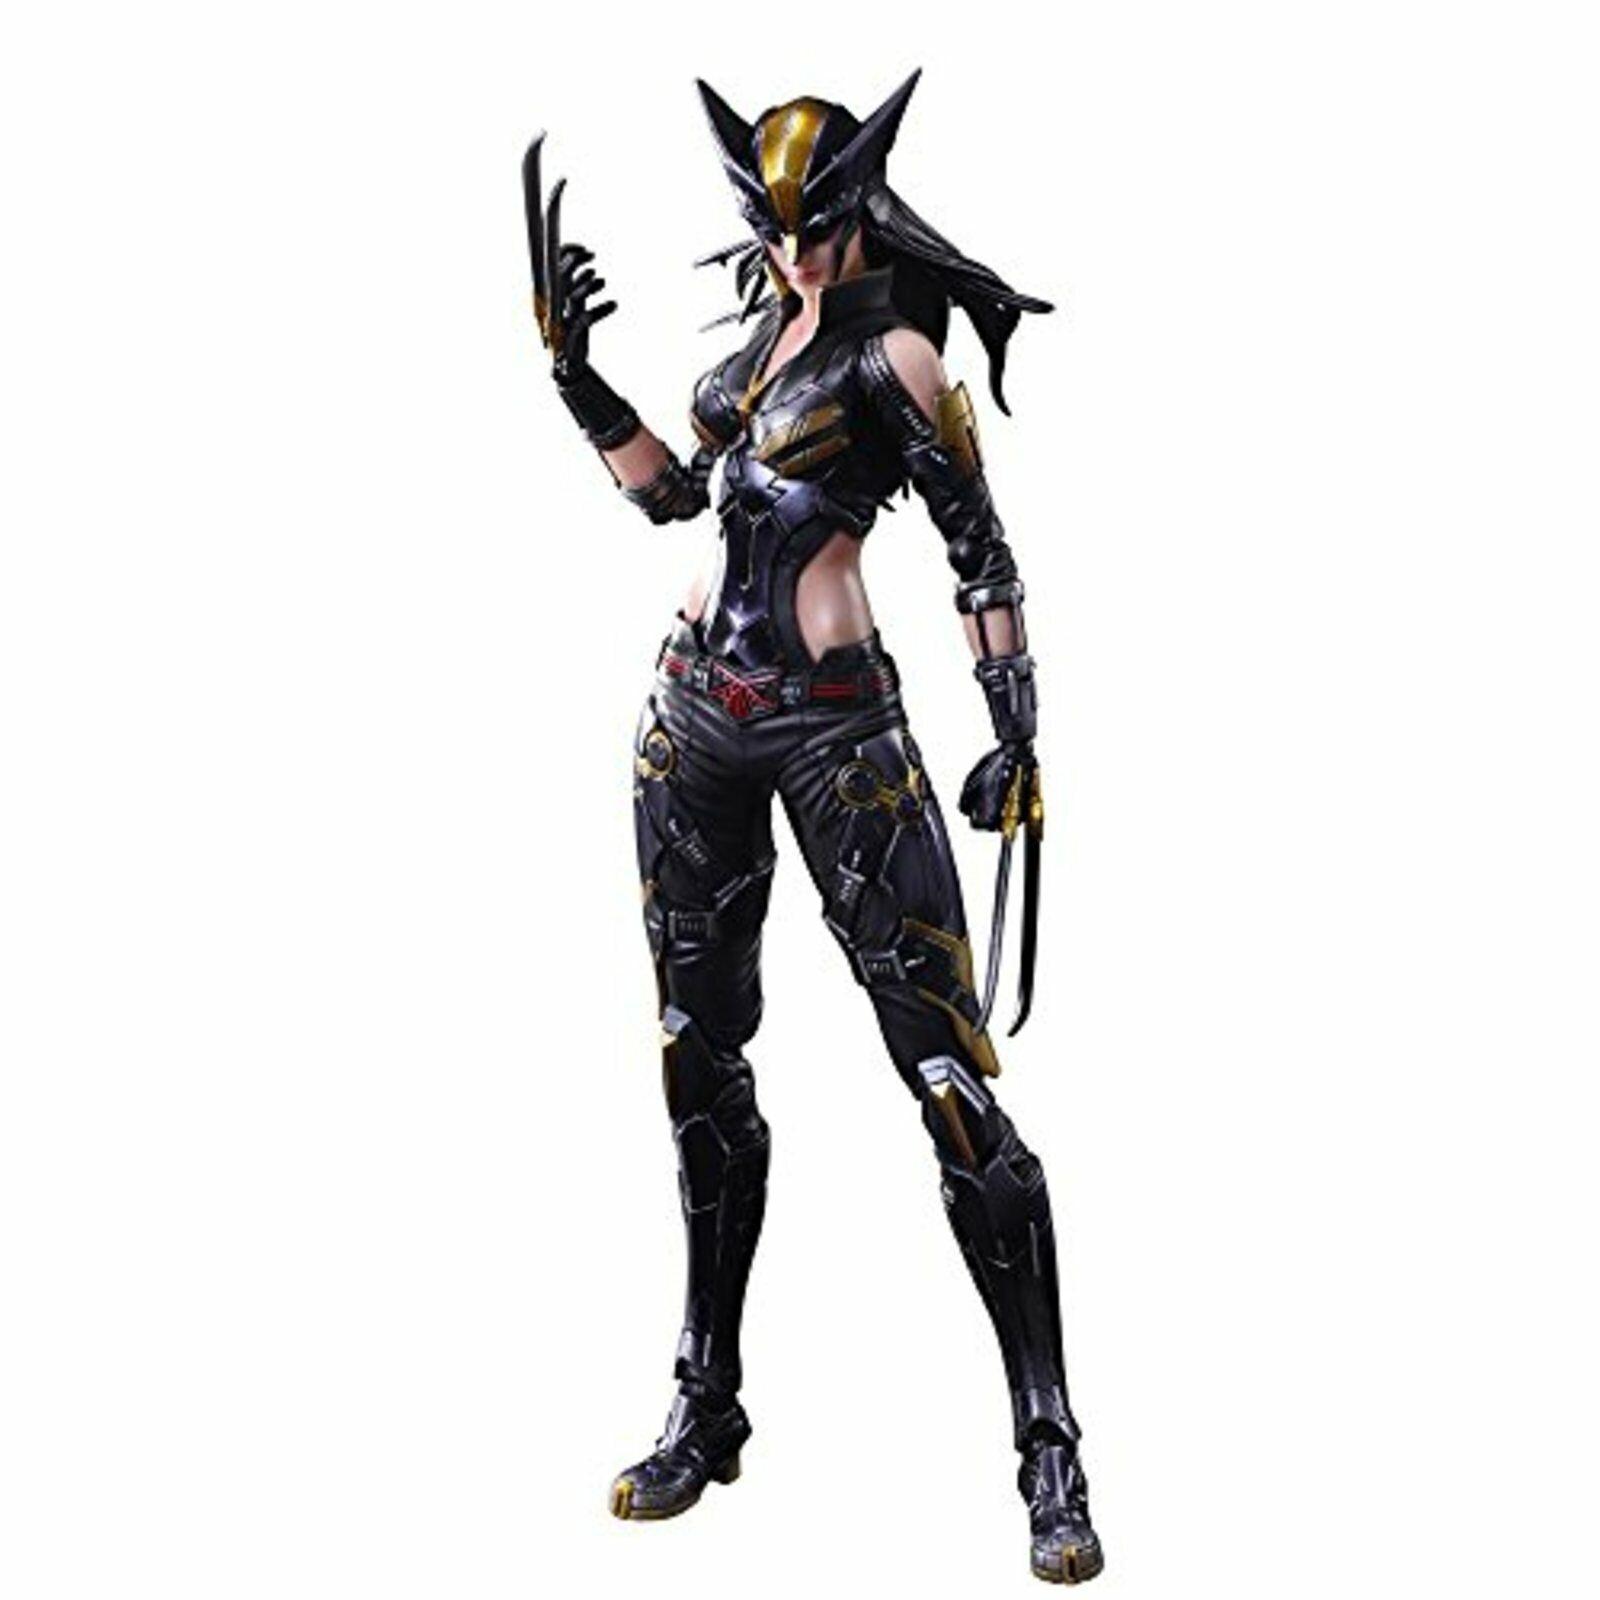 Square Enix Marvel Universe Variant Play Arts Kai X-Men X-23 Action Figure F S